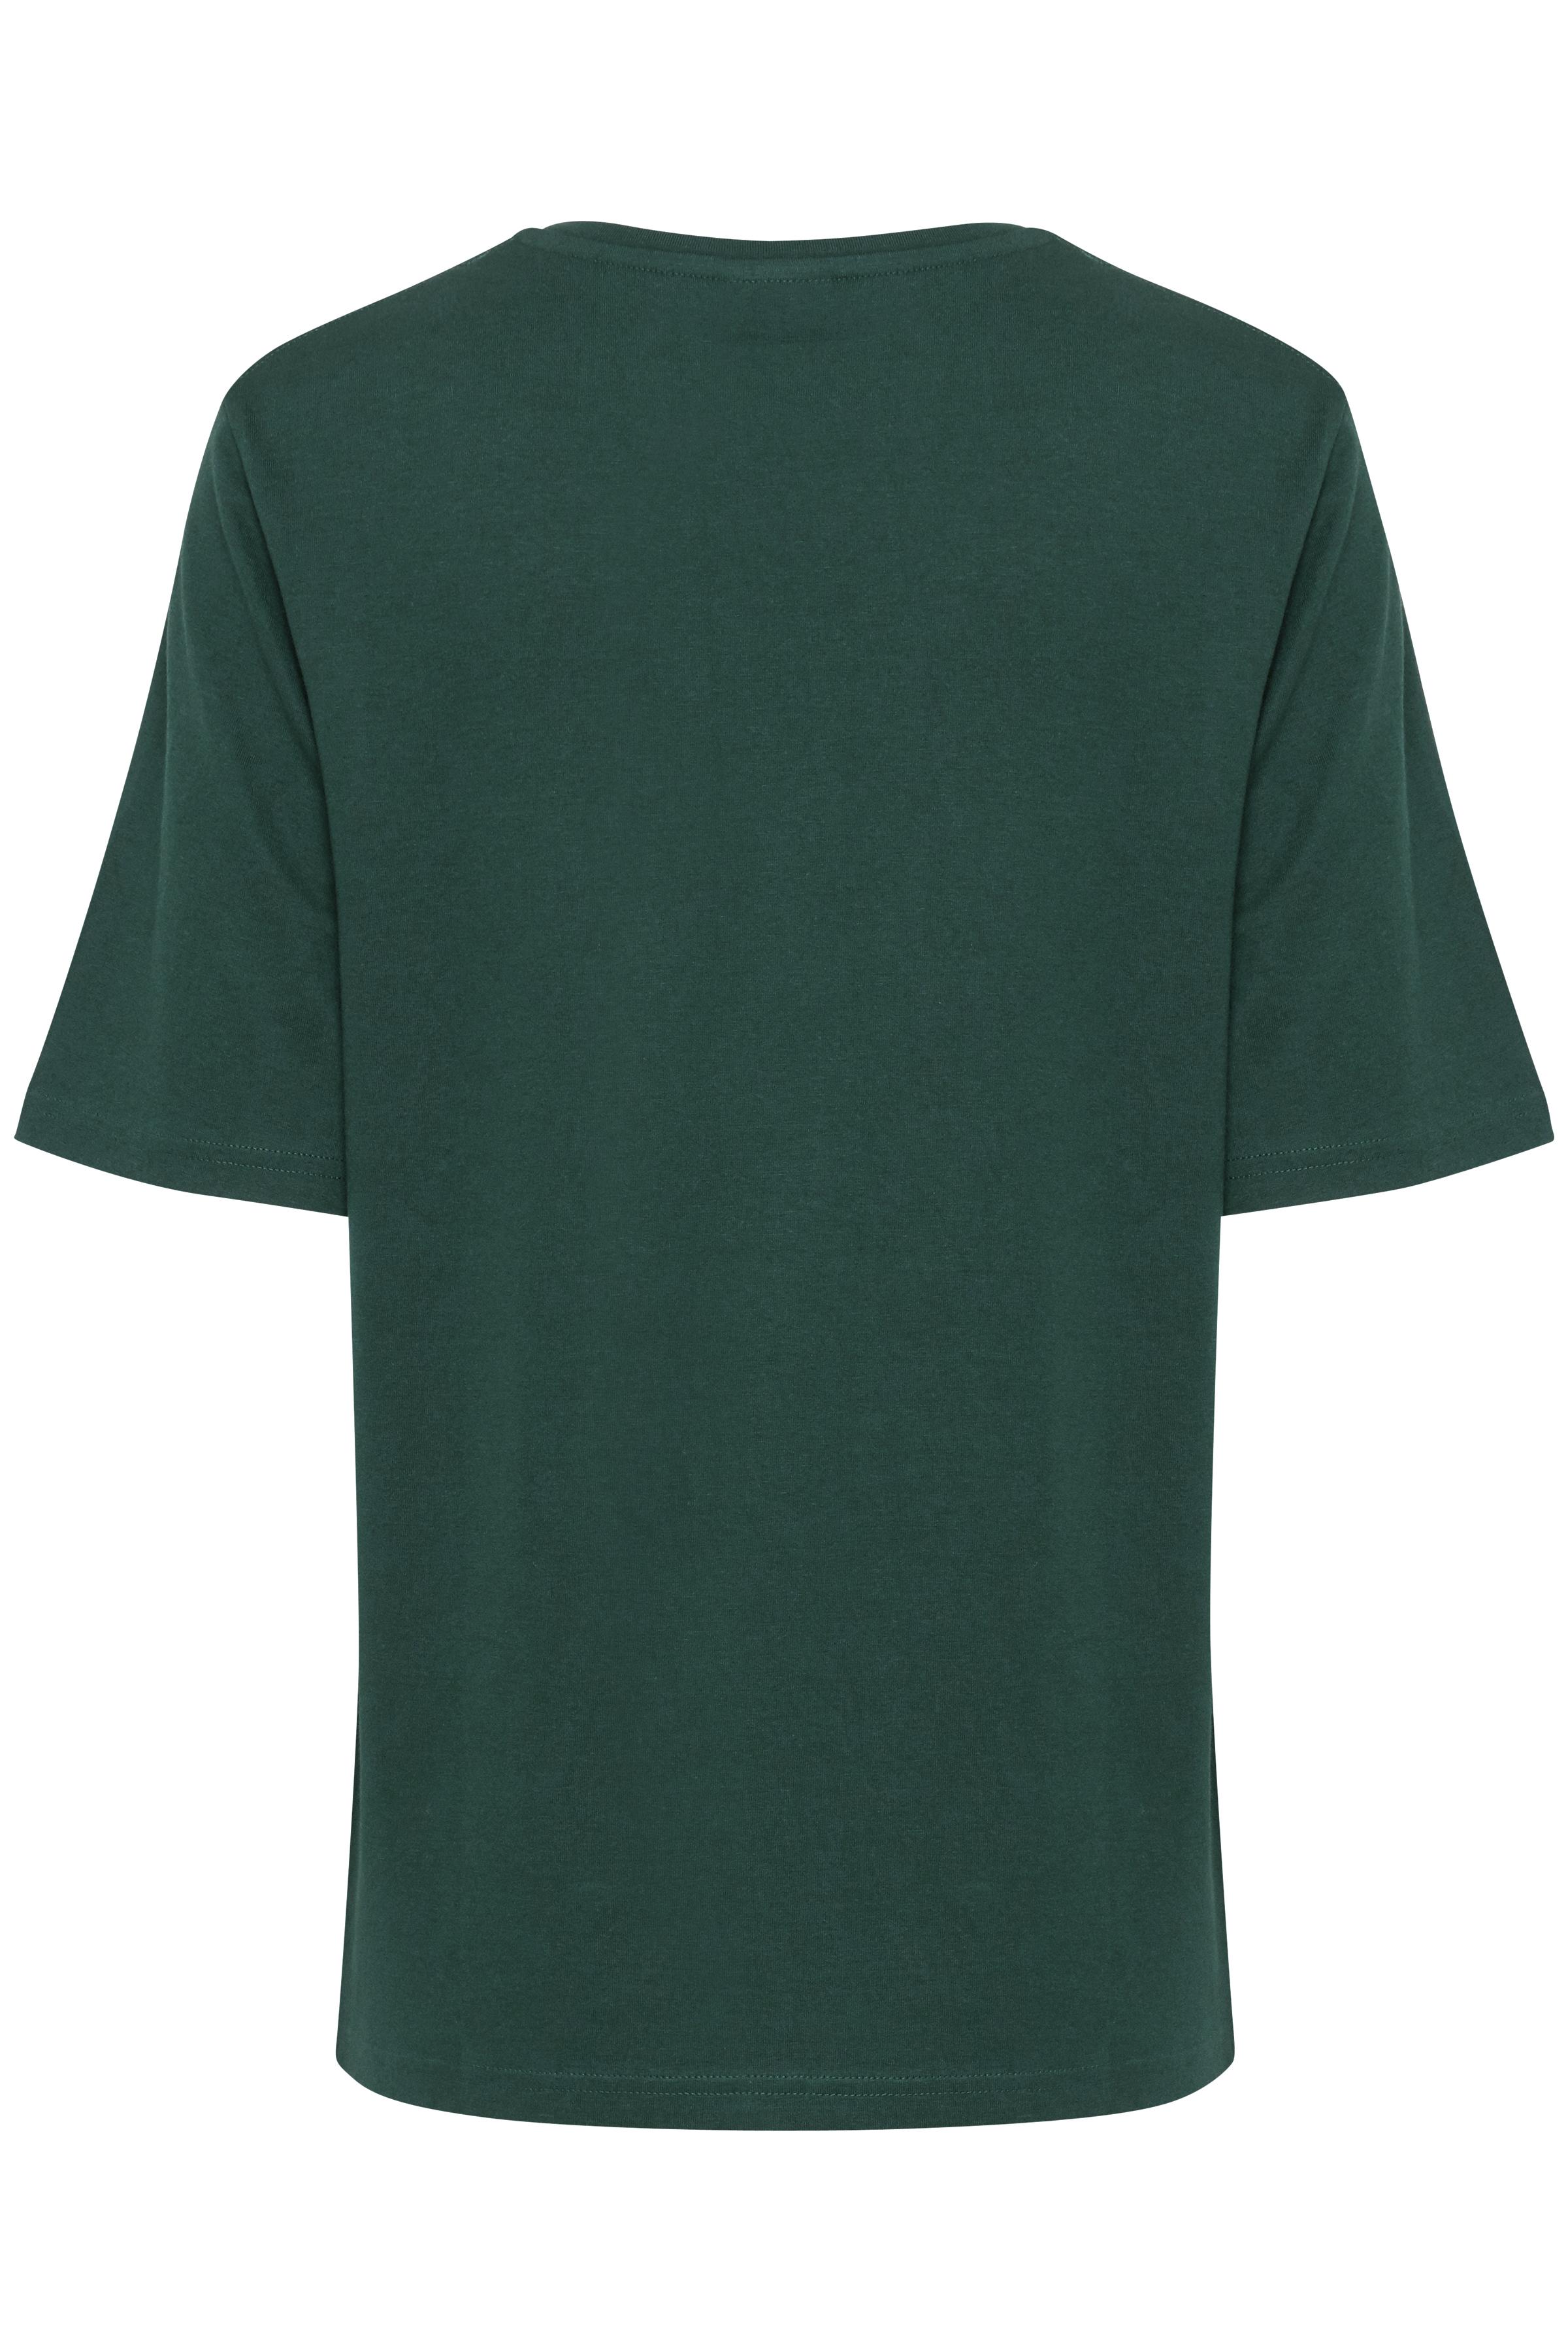 Majestic Green T-shirt fra b.young – Køb Majestic Green T-shirt fra str. XS-XXL her